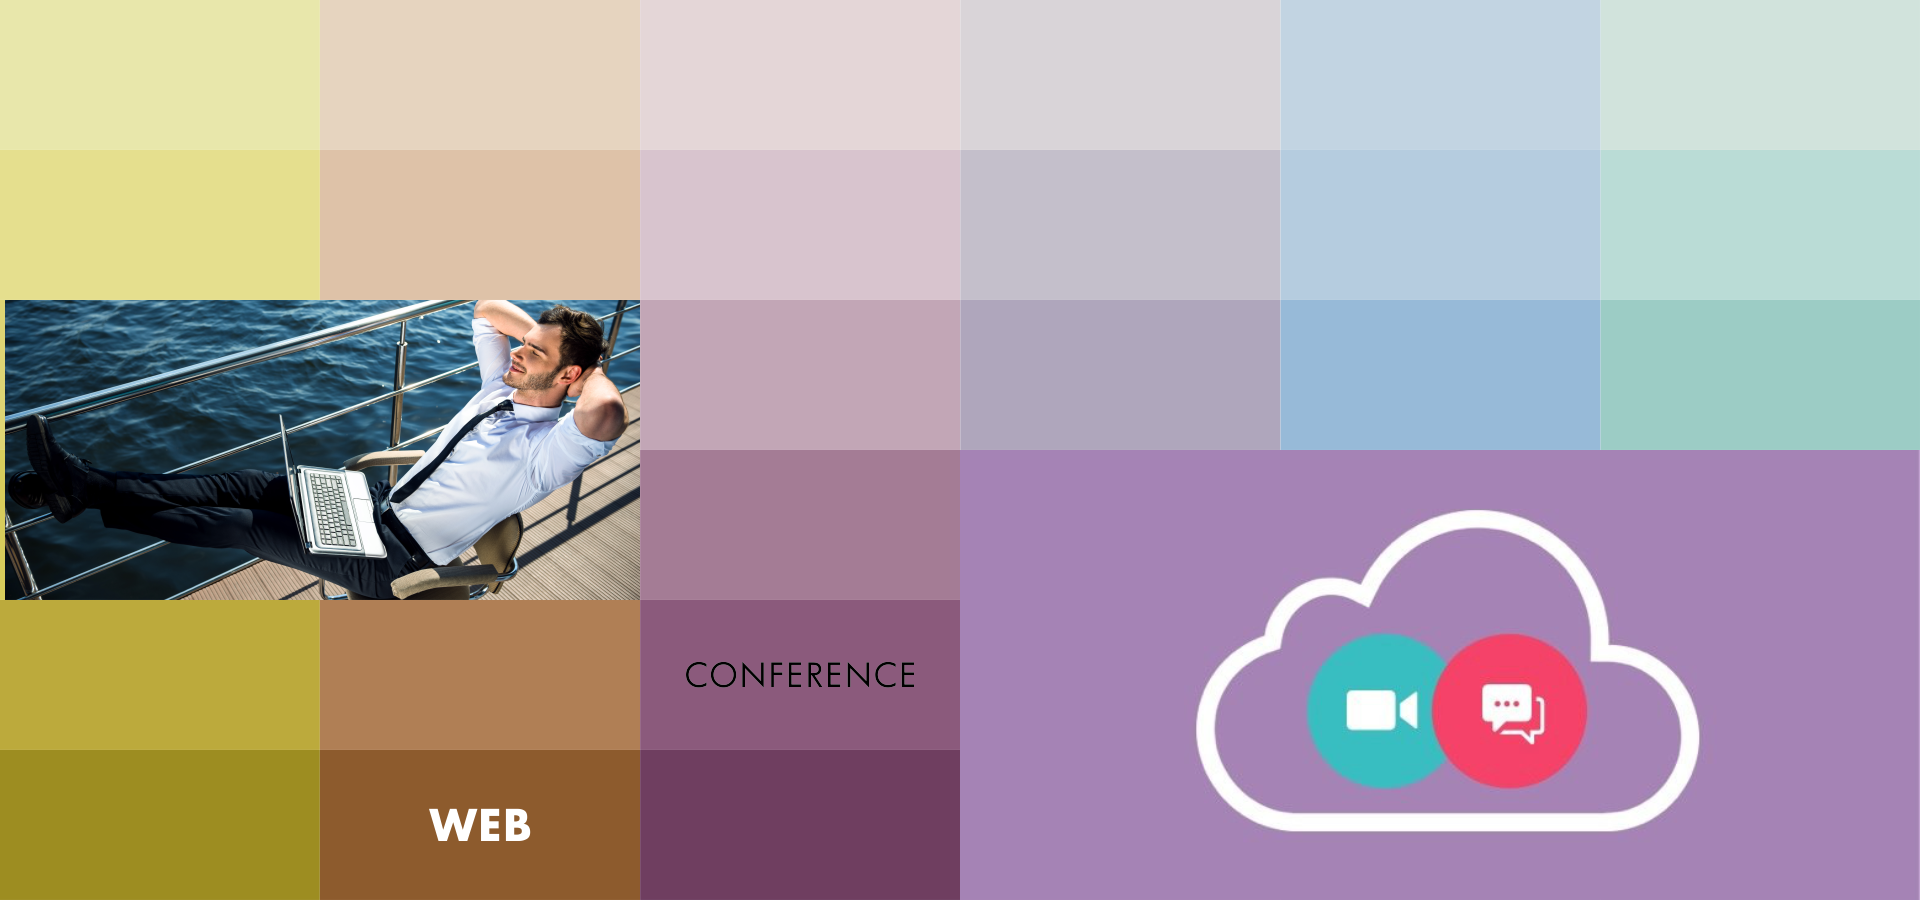 promelit - web conference 2.png